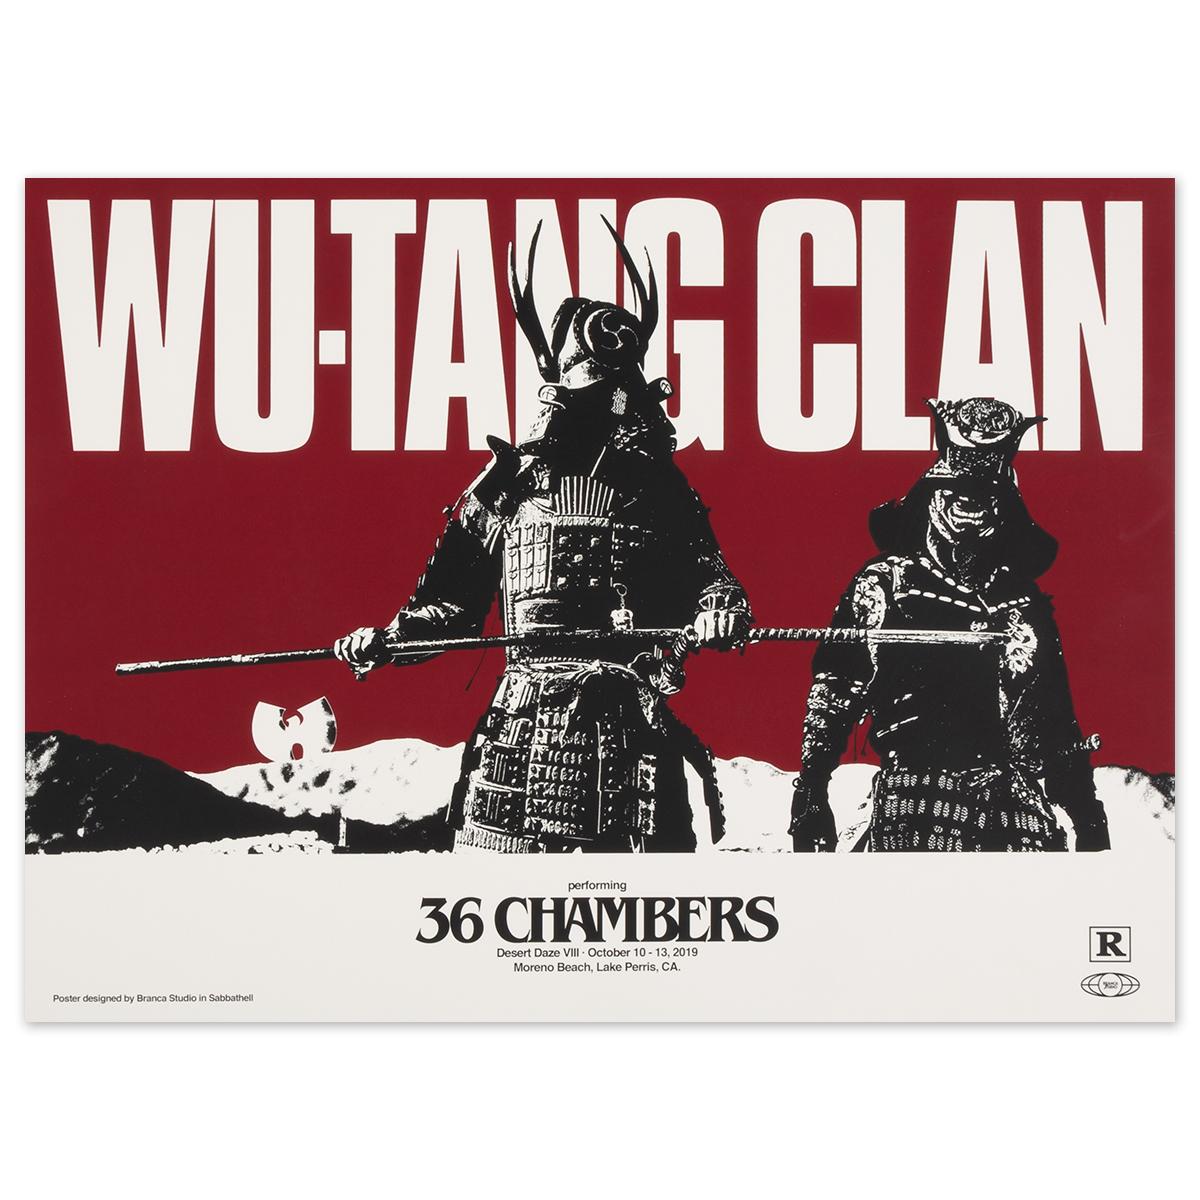 2019 Wu Tang Clan poster by Branca Studios